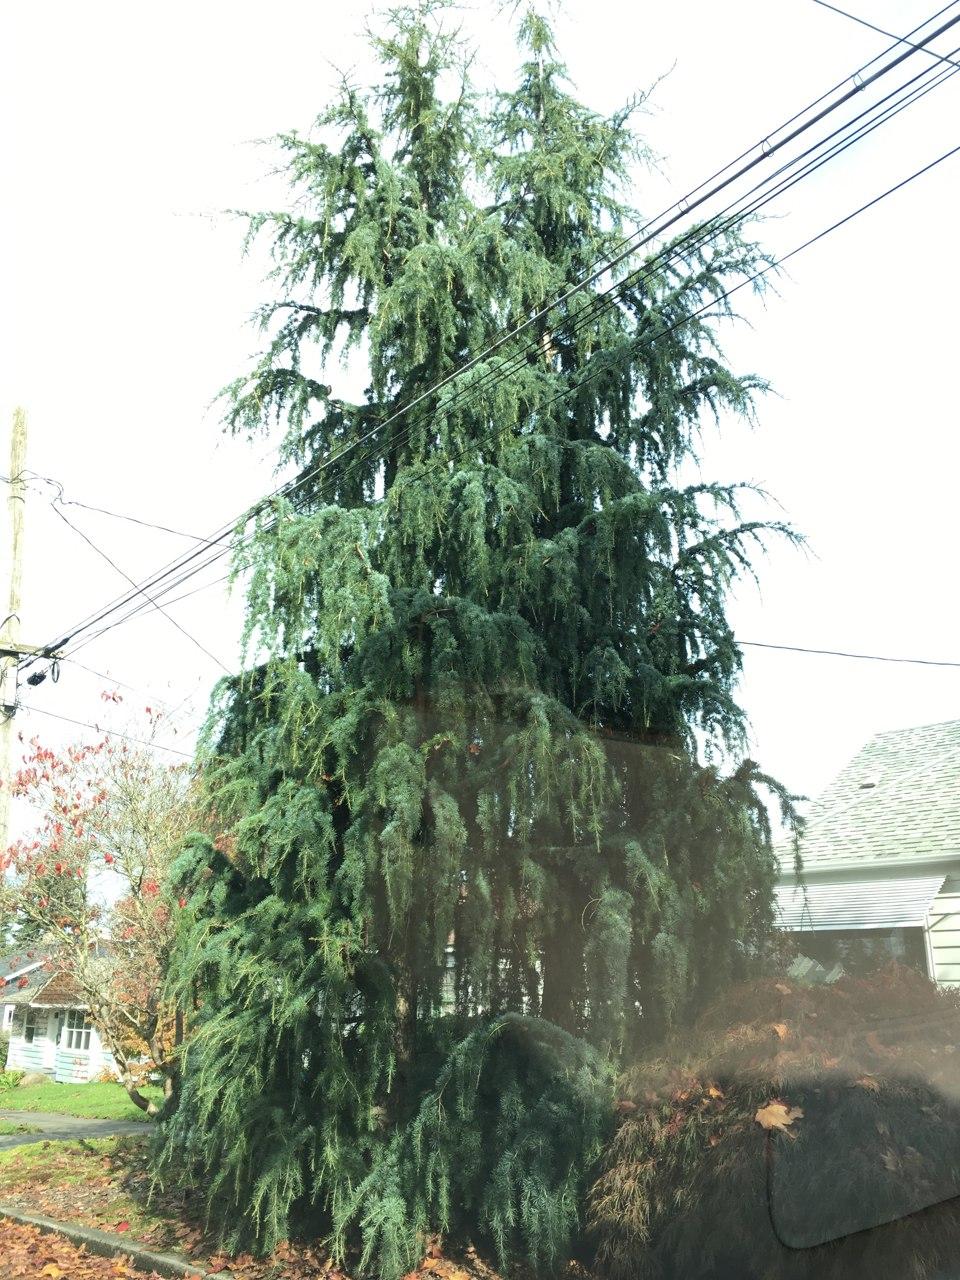 Cedrus libani Blue Angel Cedar of Lebanon evergreen conifer blue needles